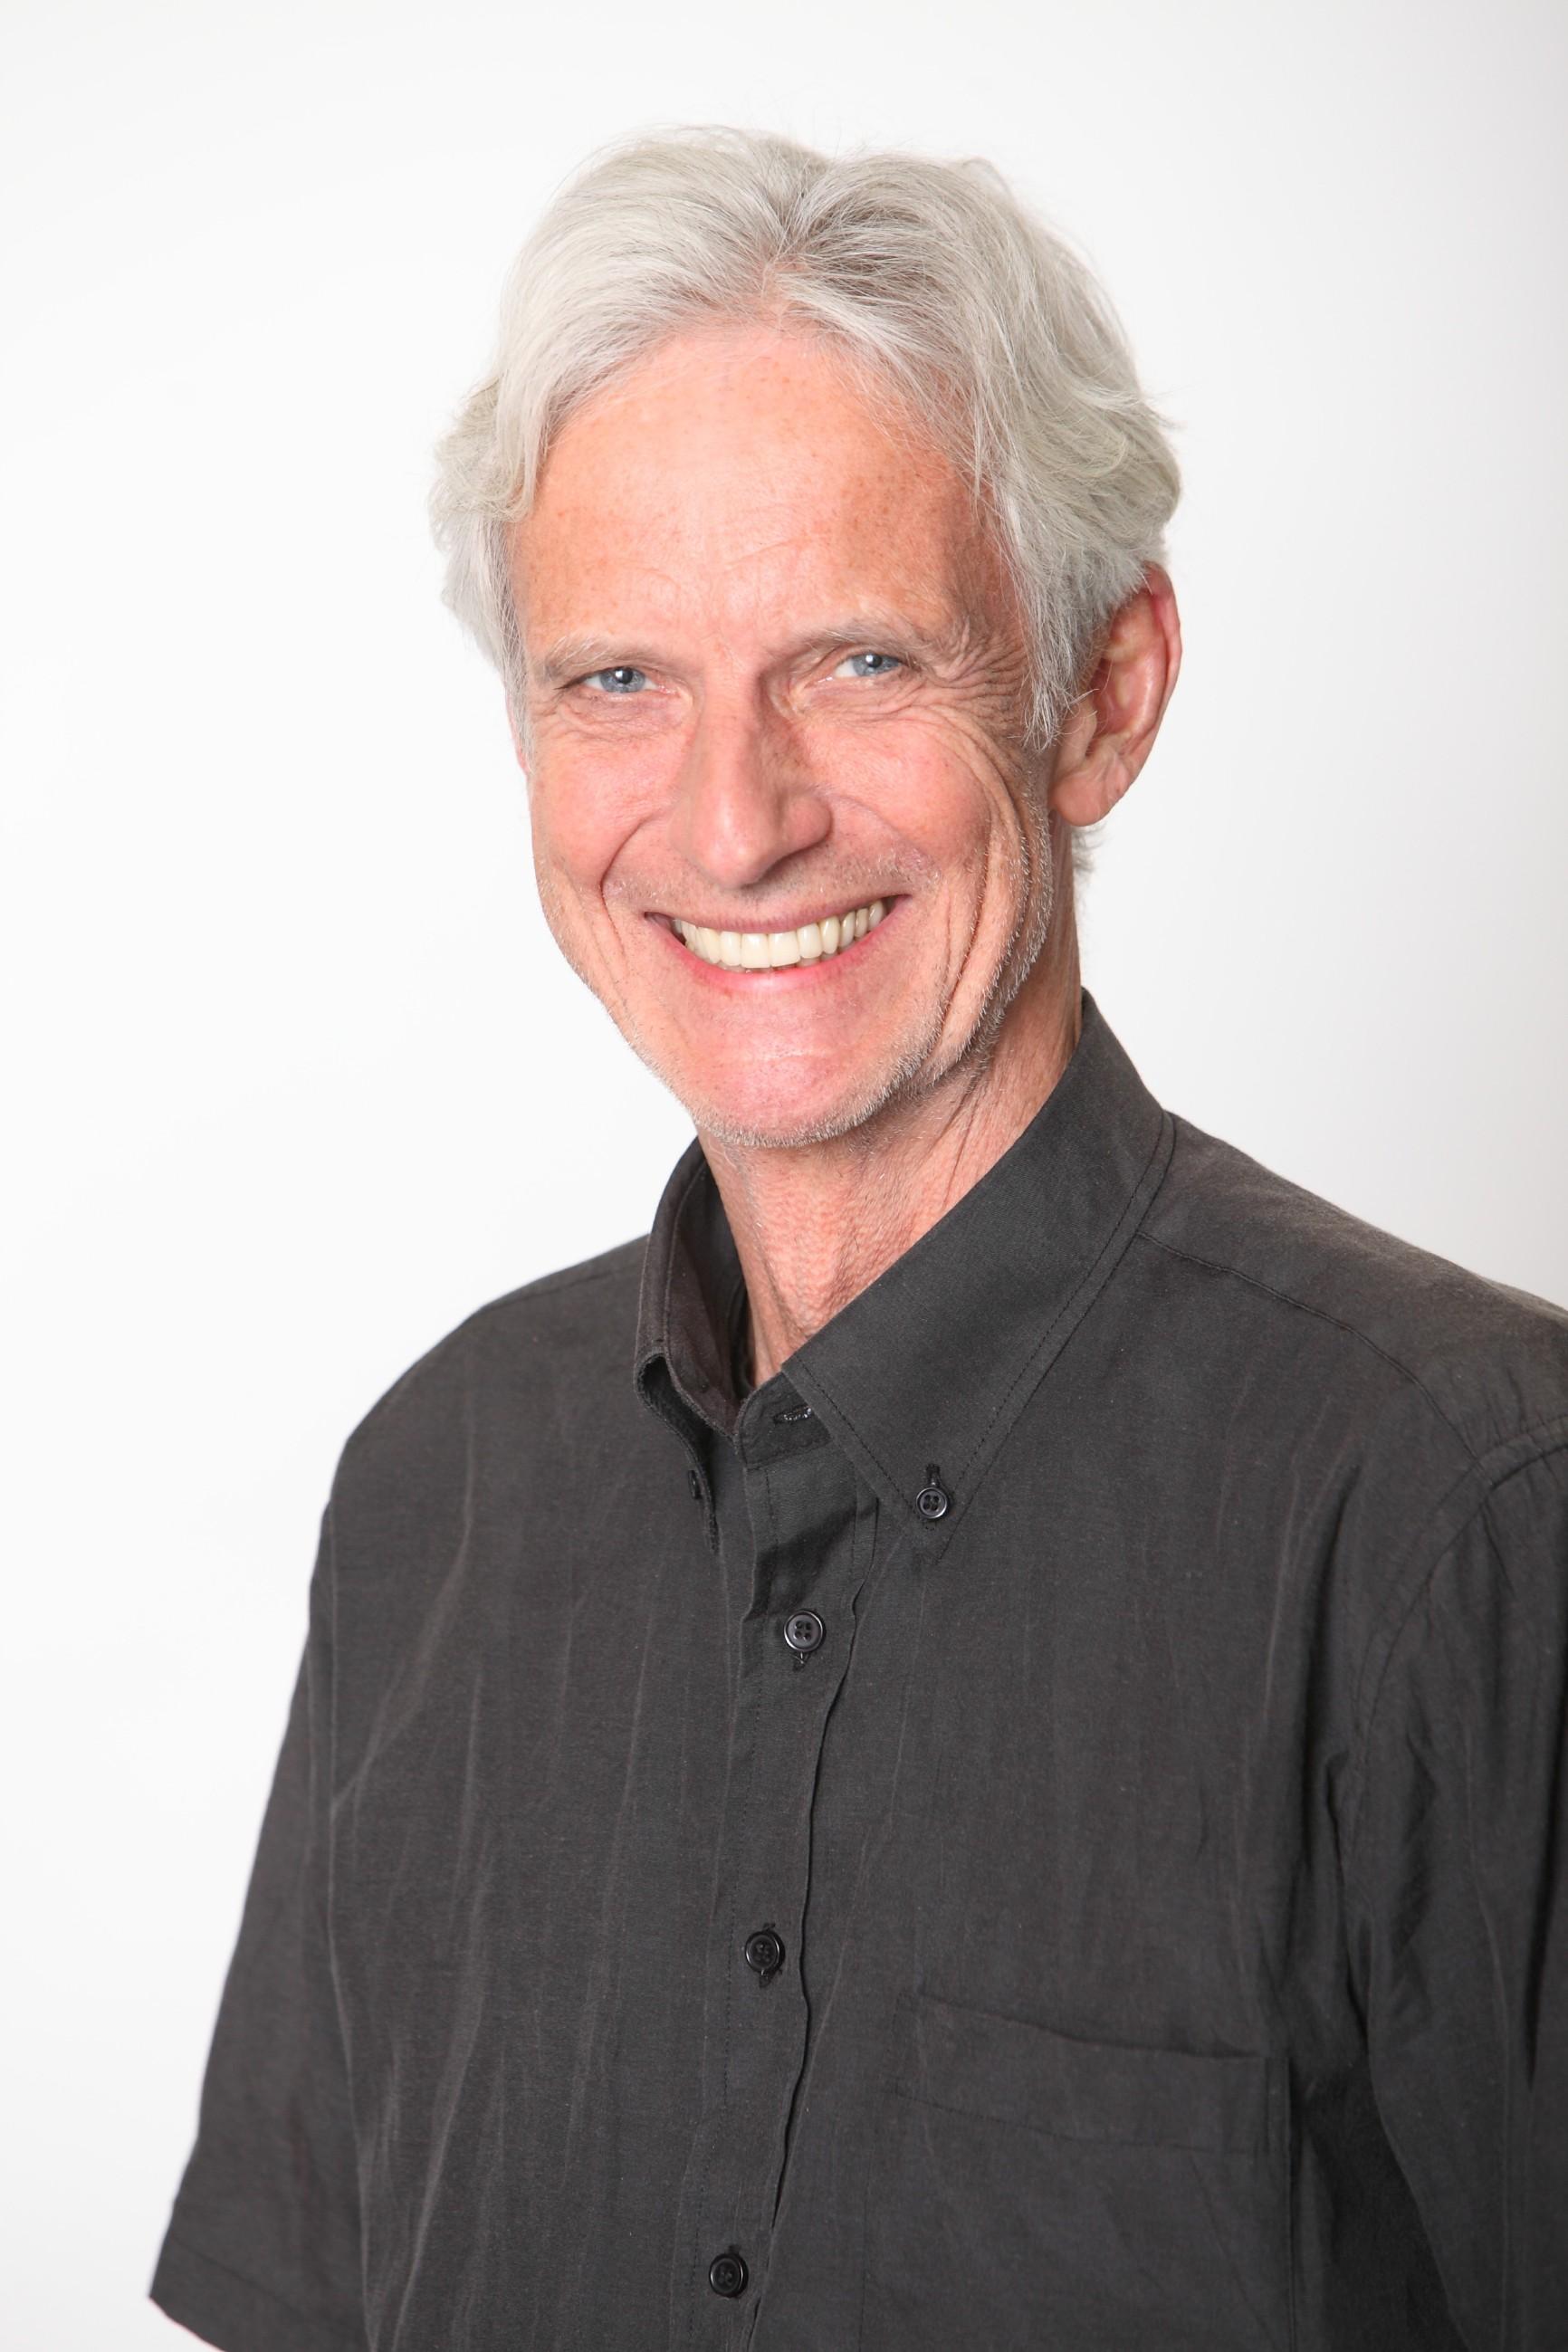 Sommer Dschungelcamp 2015 Kandidaten Mathieu Carriere